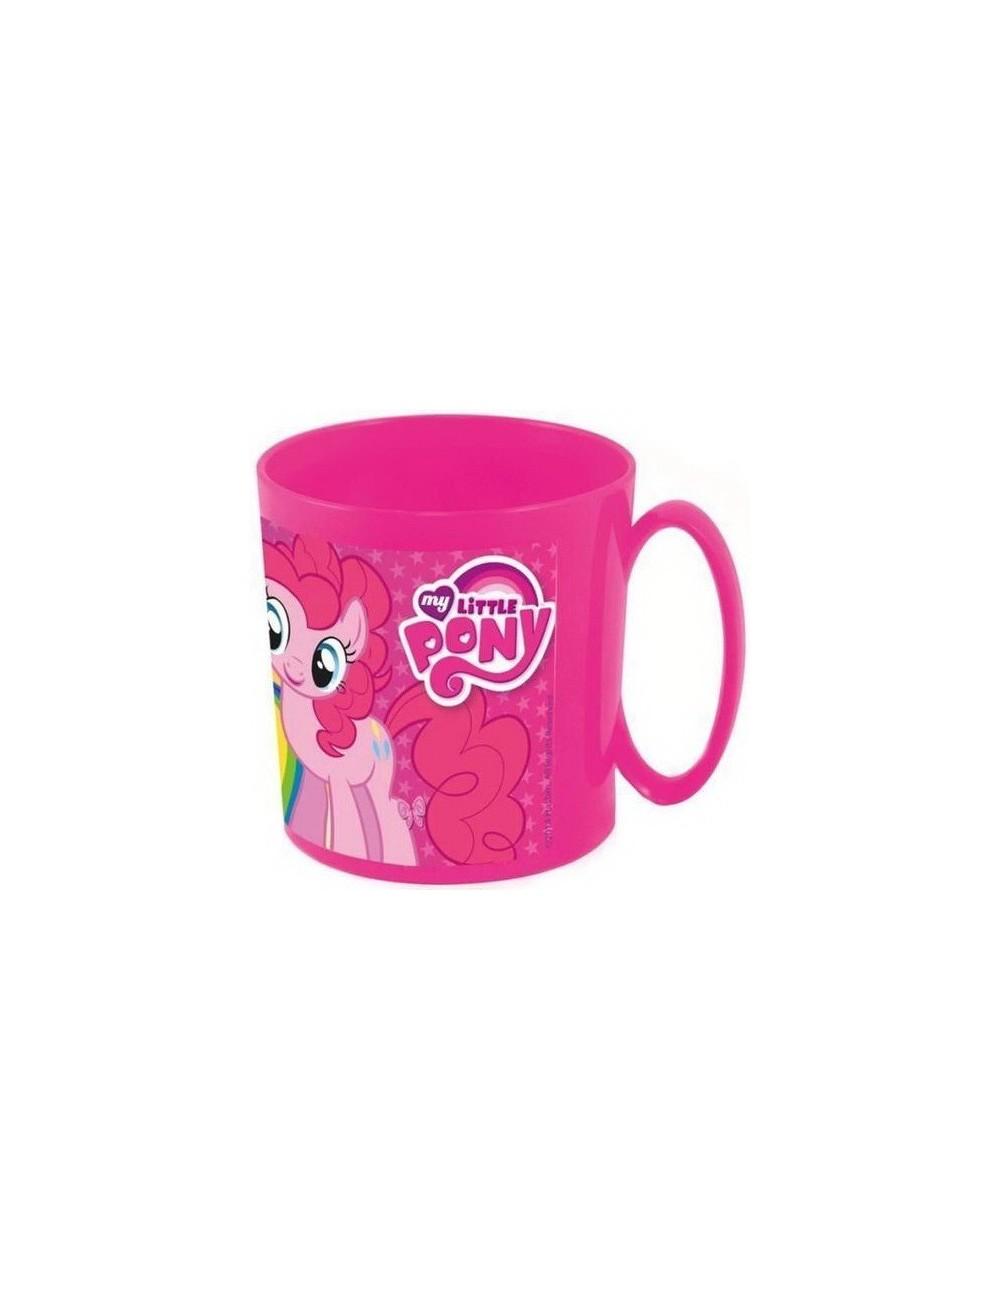 Cana microunde 350 ml, My little Pony, fucsia